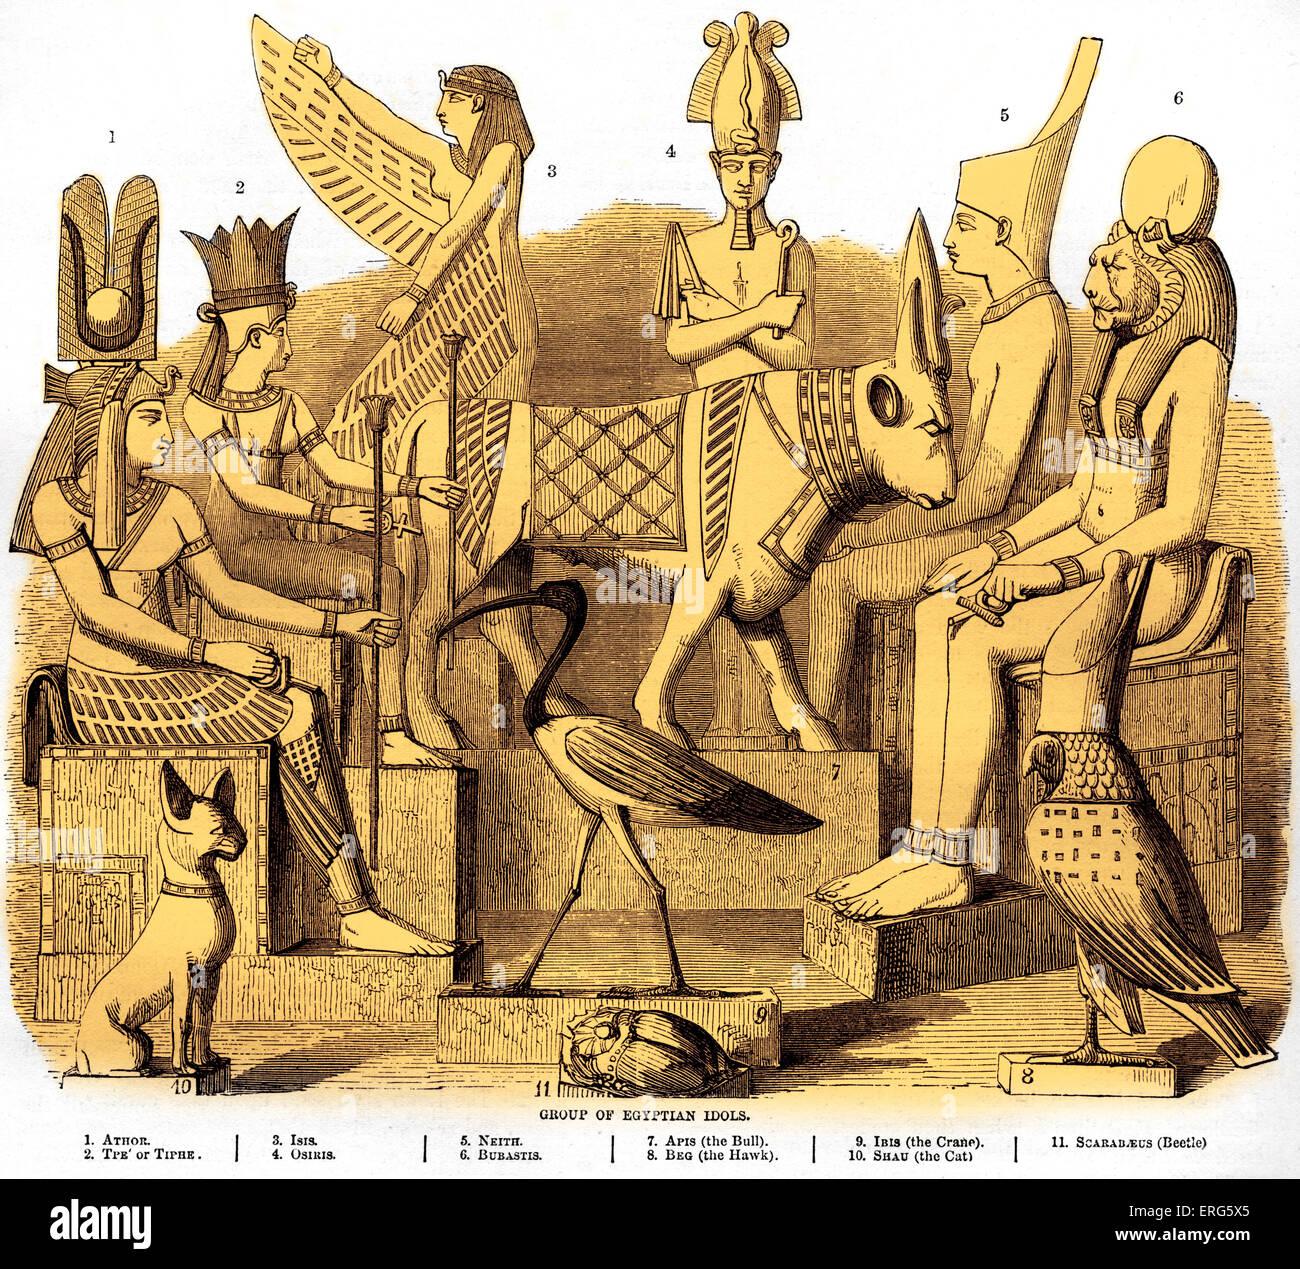 Group Egypt 70